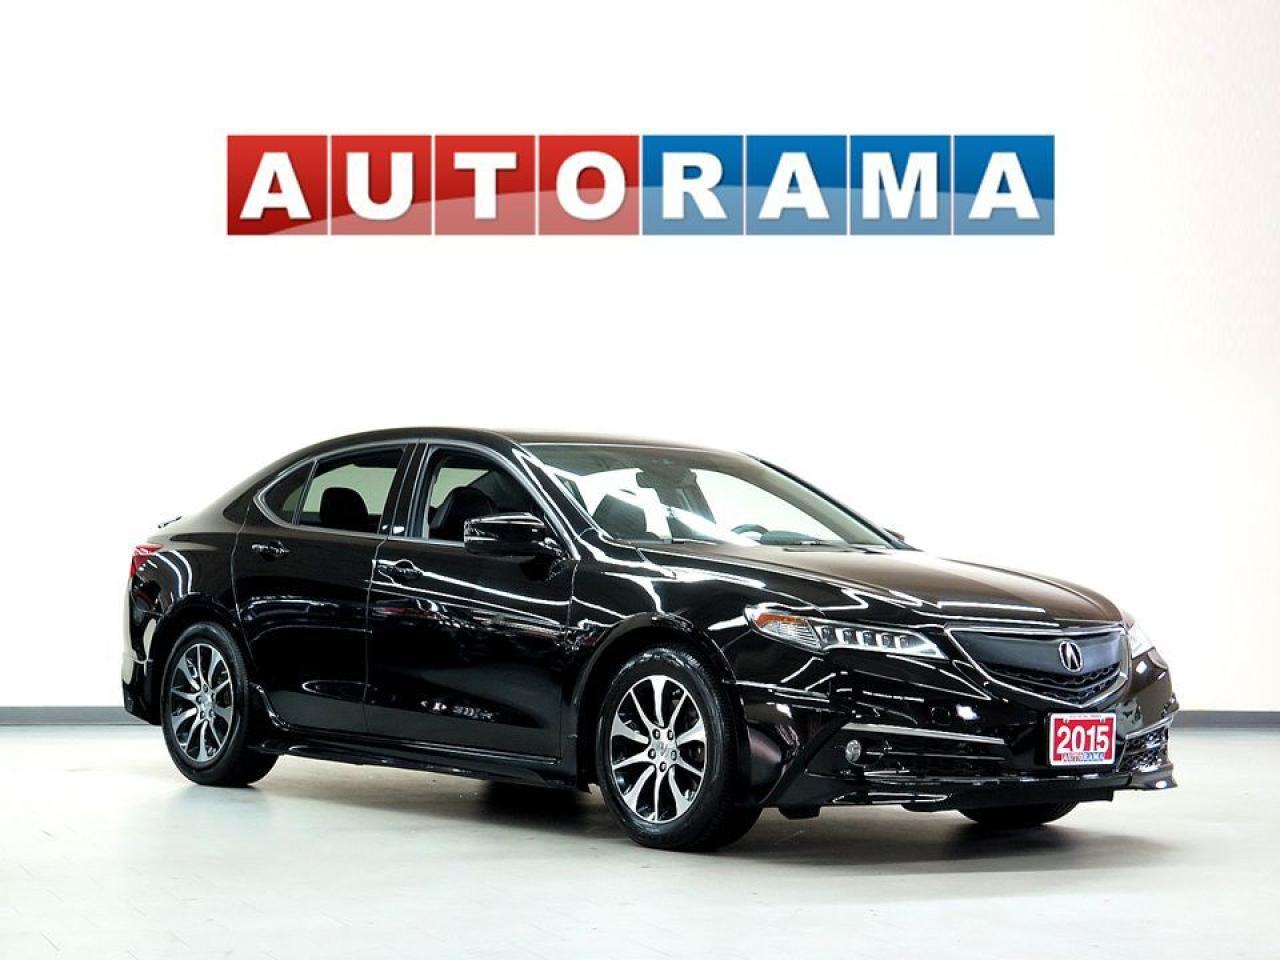 2015 Acura TLX NAVIGATION LEATHER SUNROOF BACKUP CAM